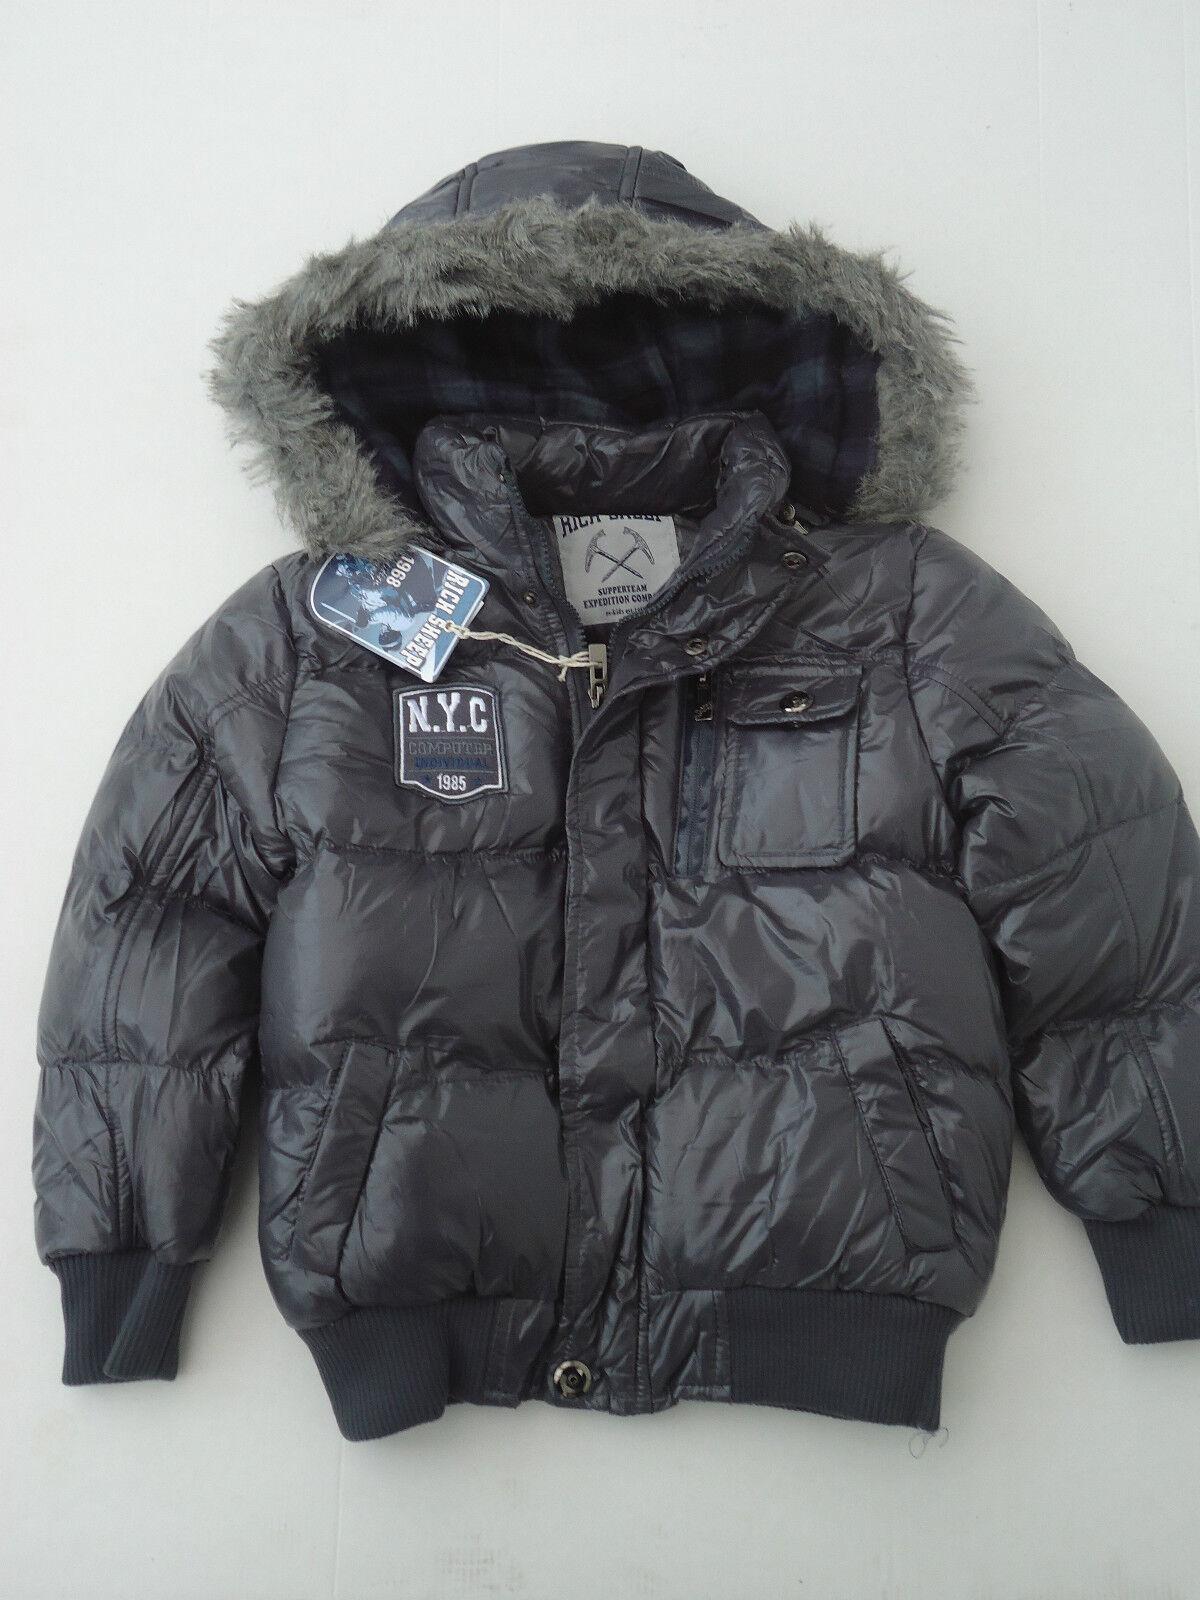 winterjacke jungen winter jacke gr 104 158 ebay. Black Bedroom Furniture Sets. Home Design Ideas